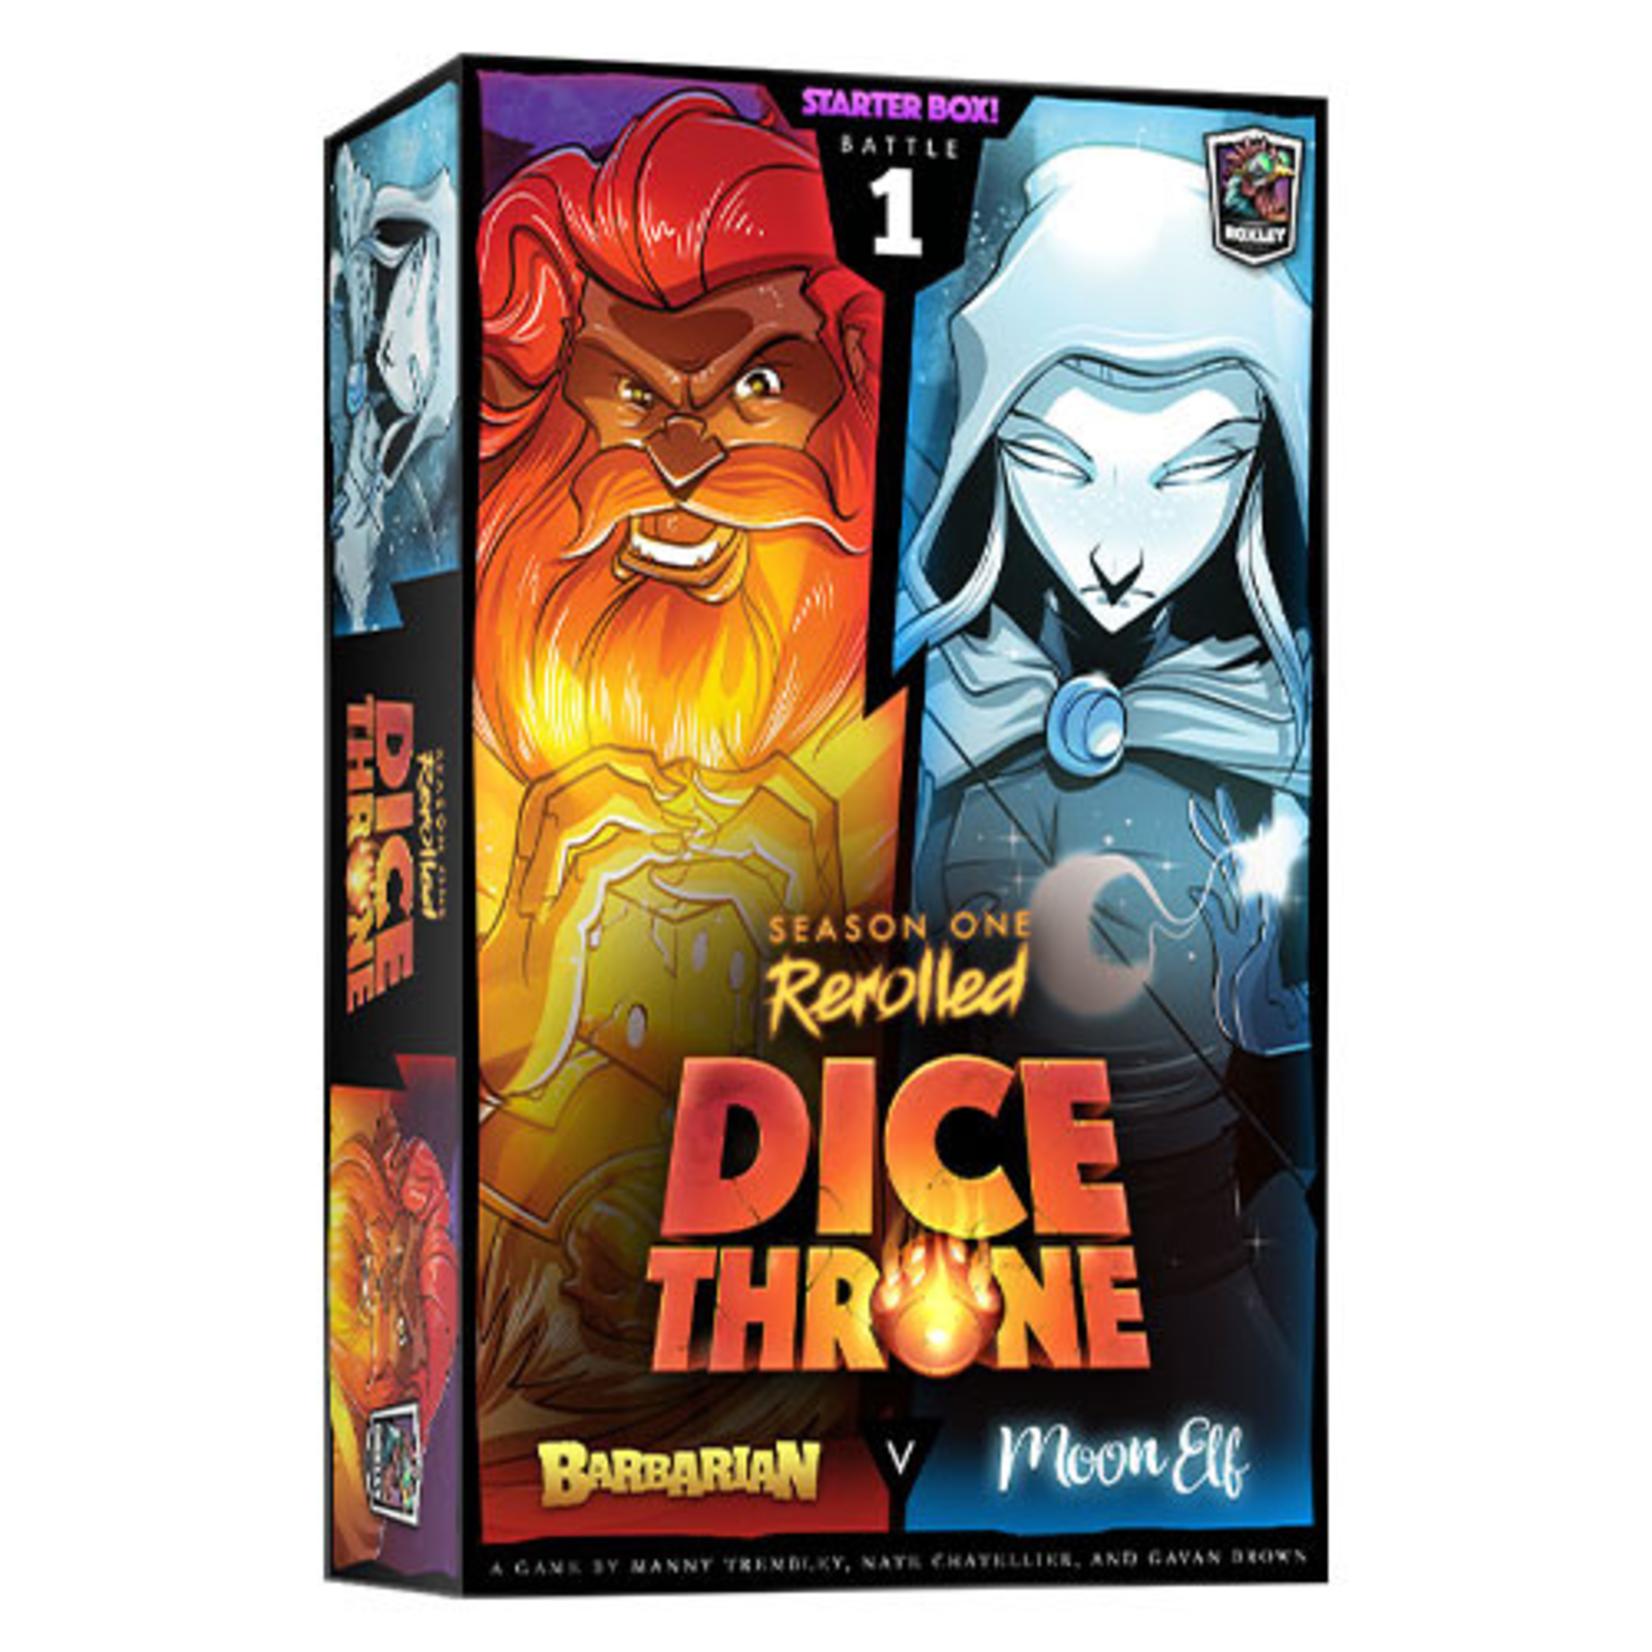 Roxley Dice Throne Season One Rerolled: Barbarian vs Moon Elf